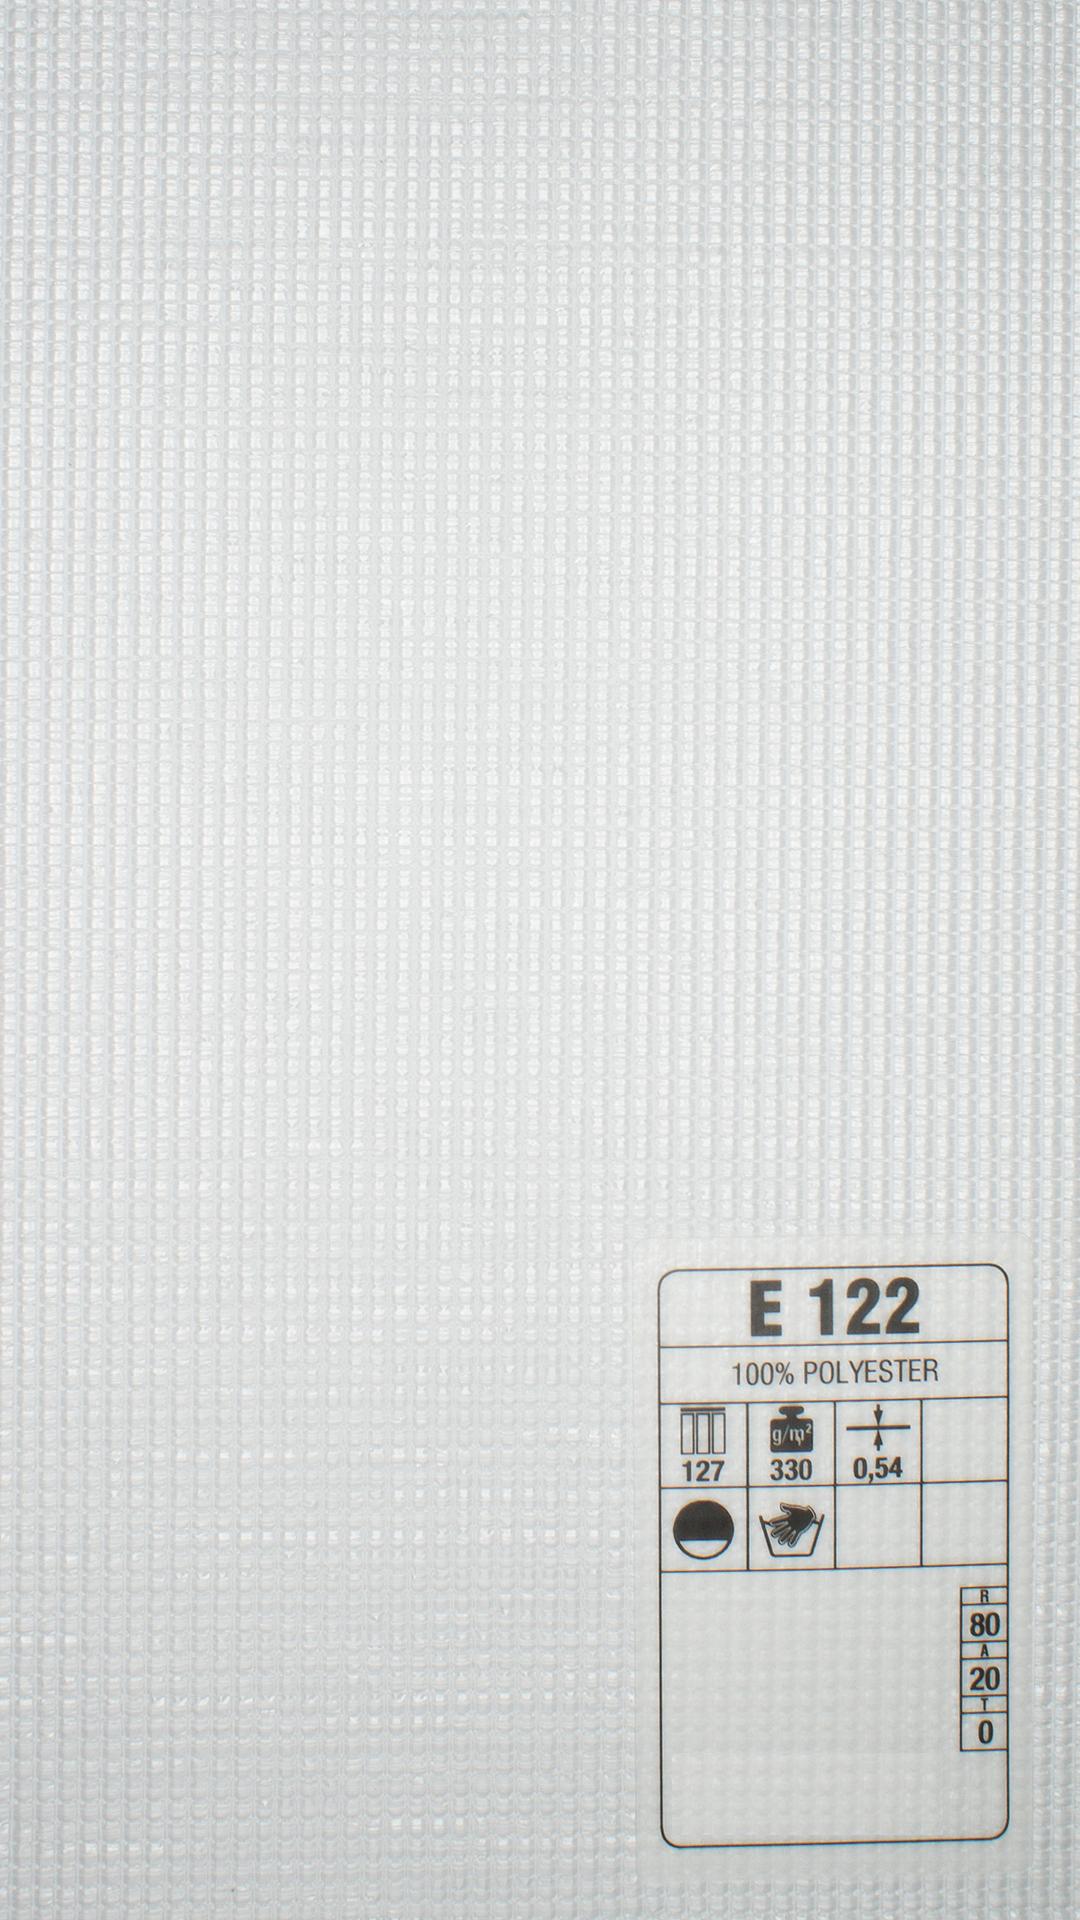 E 122